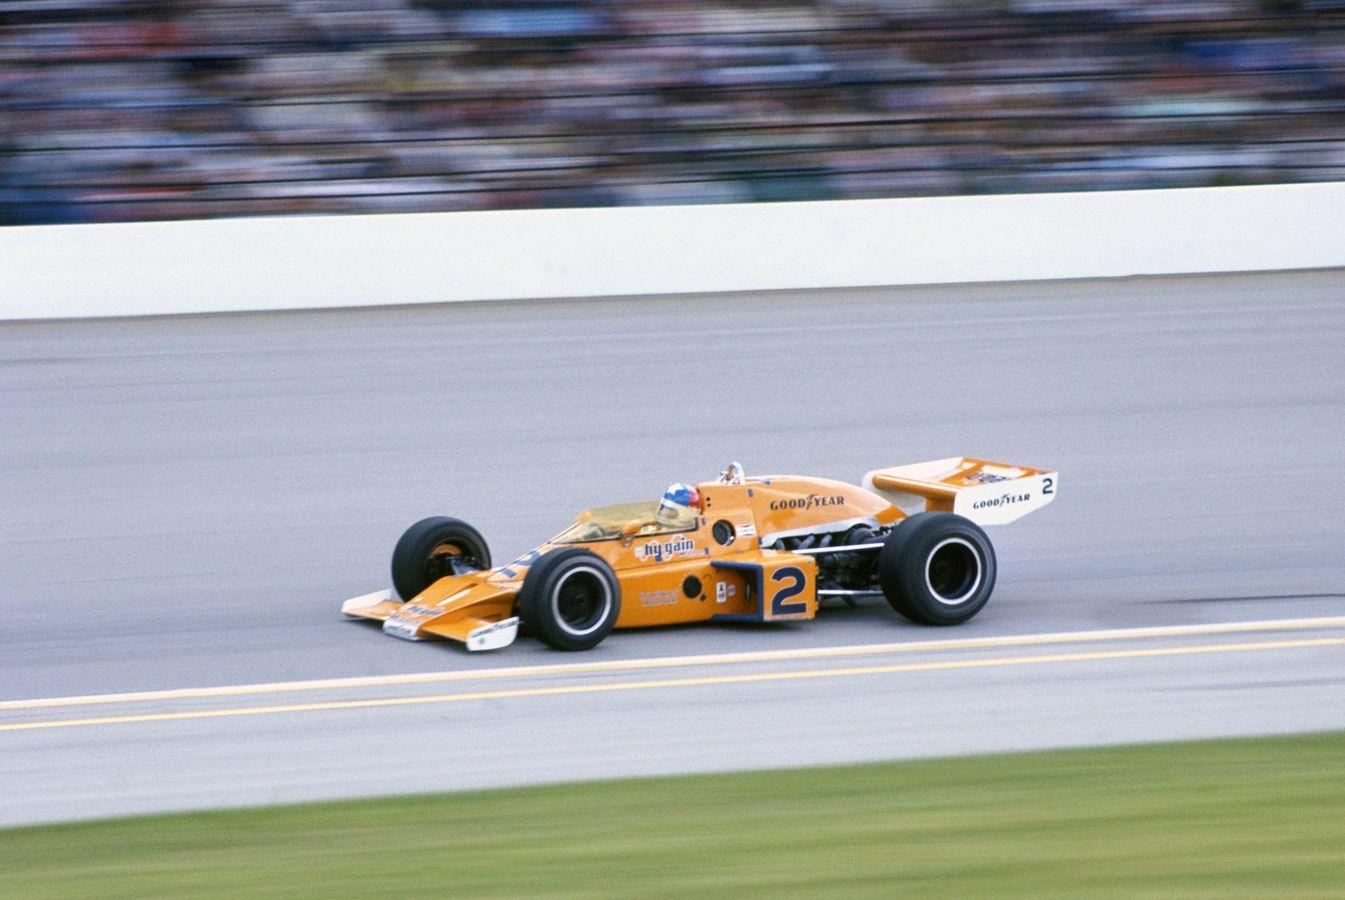 mclaren formula 1 - fernando alonso to race at indy 500 with mclaren